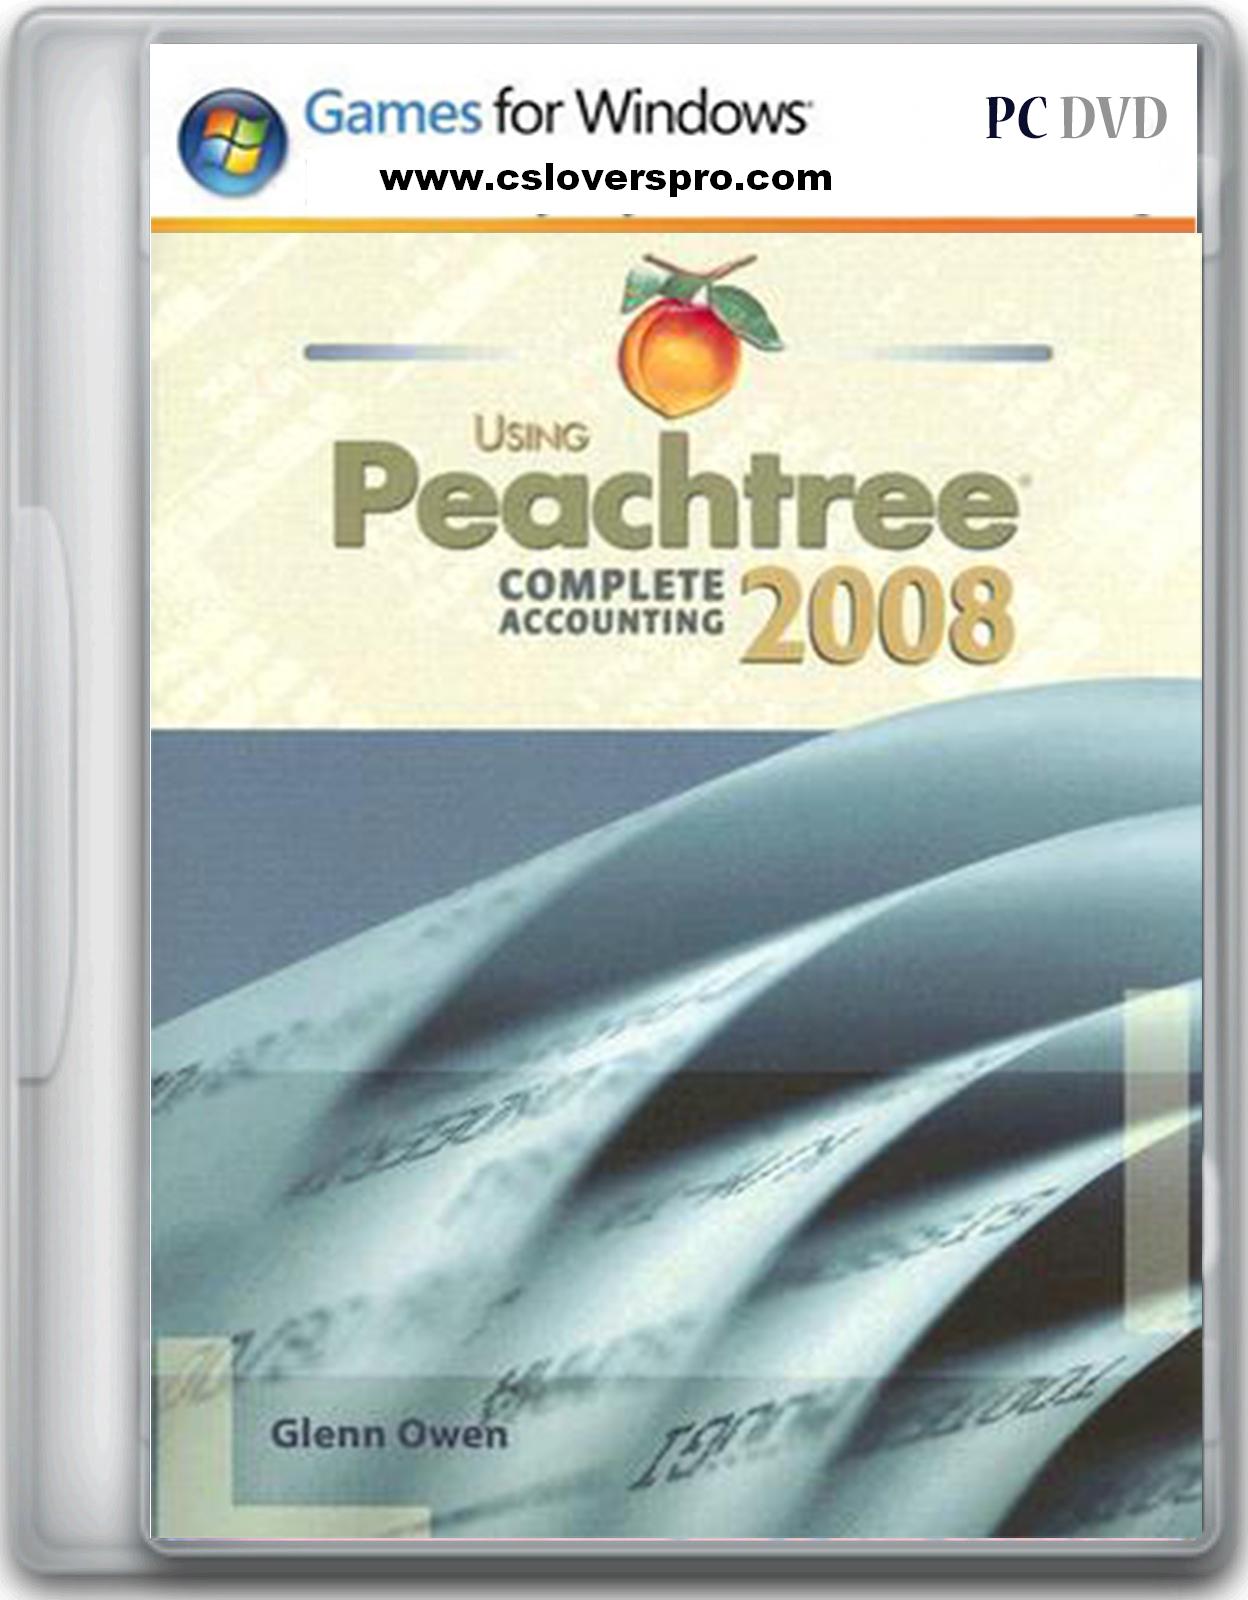 Peachtree 2008 complete accounting download oceanofexe.